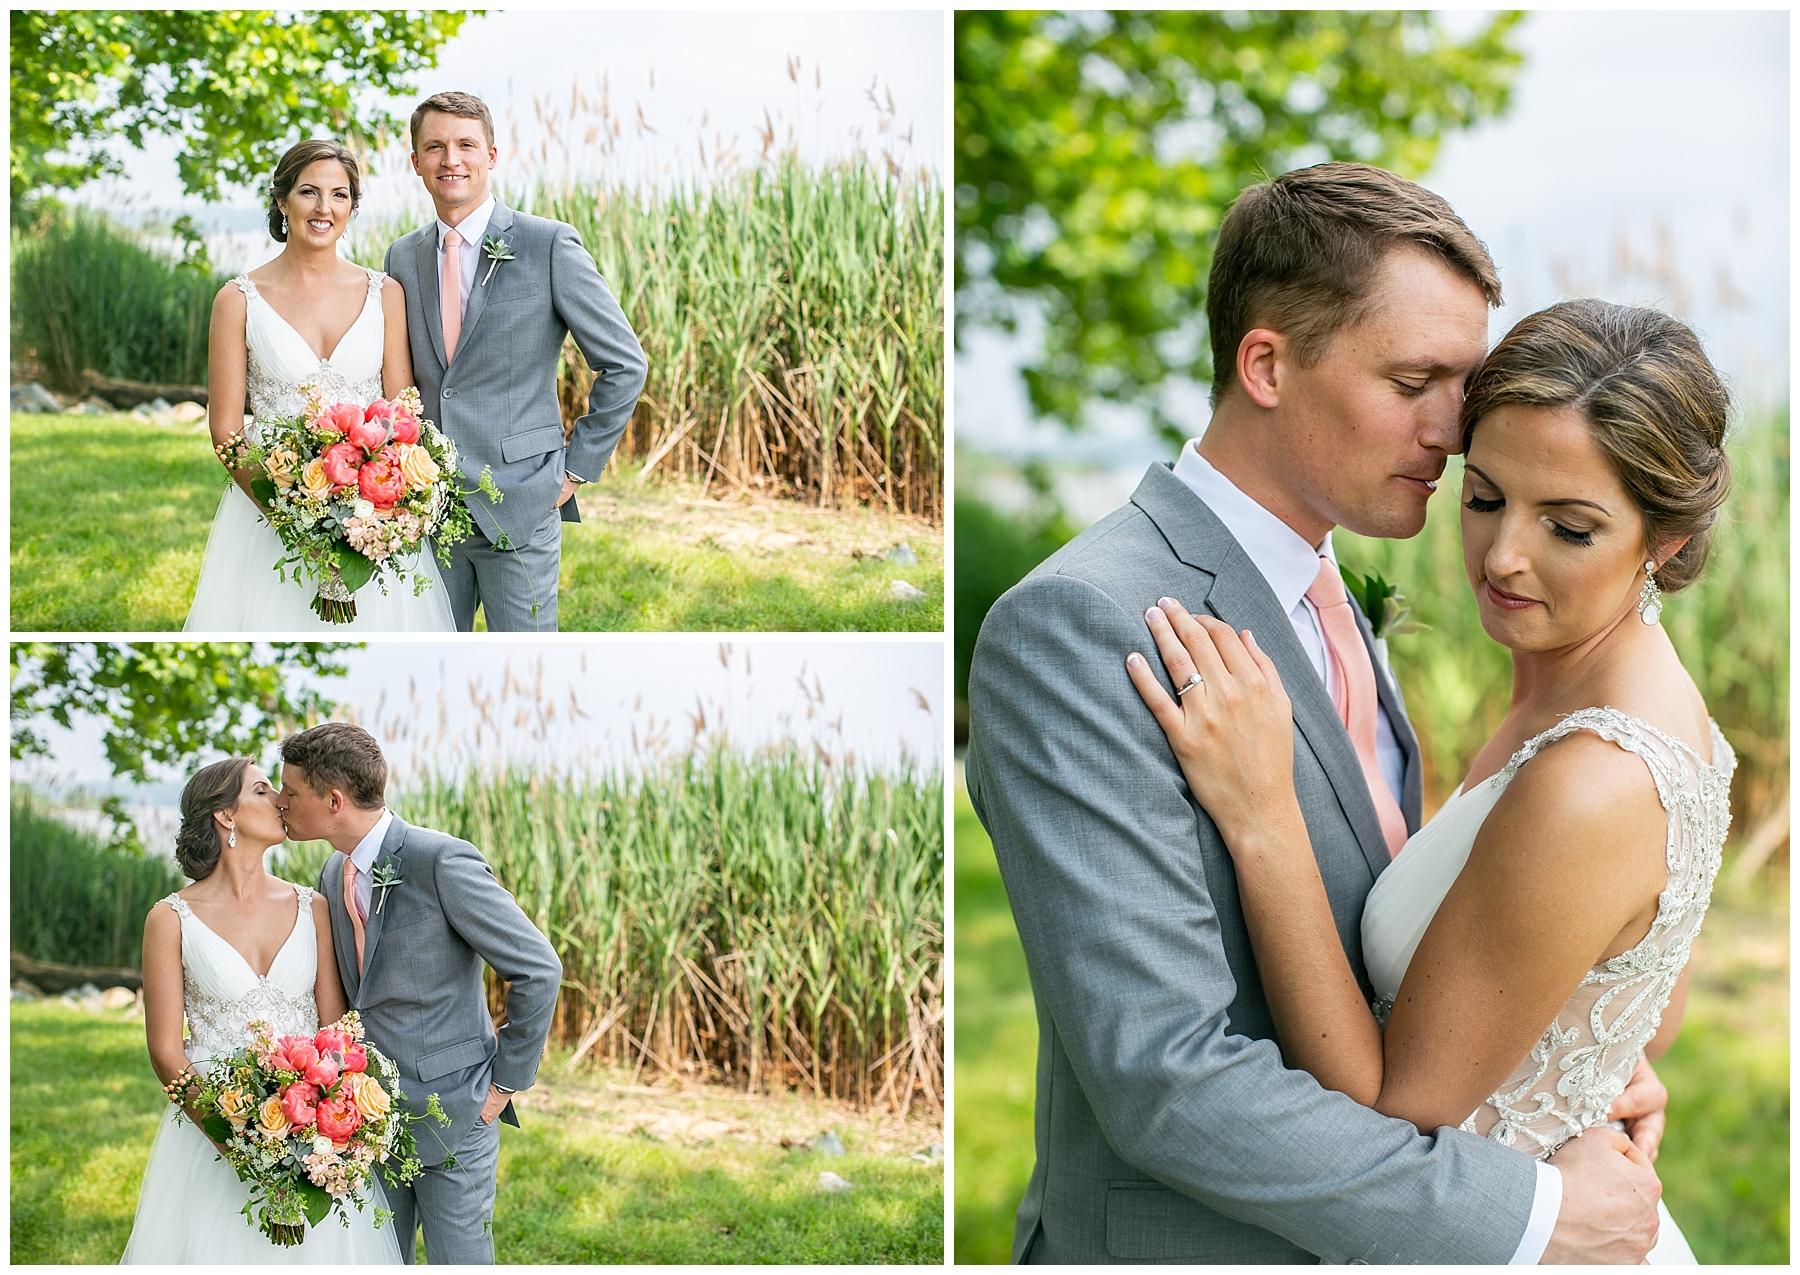 Chelsea Phil Bohemia River Overlook Wedding Living Radiant Photography photos_0034.jpg